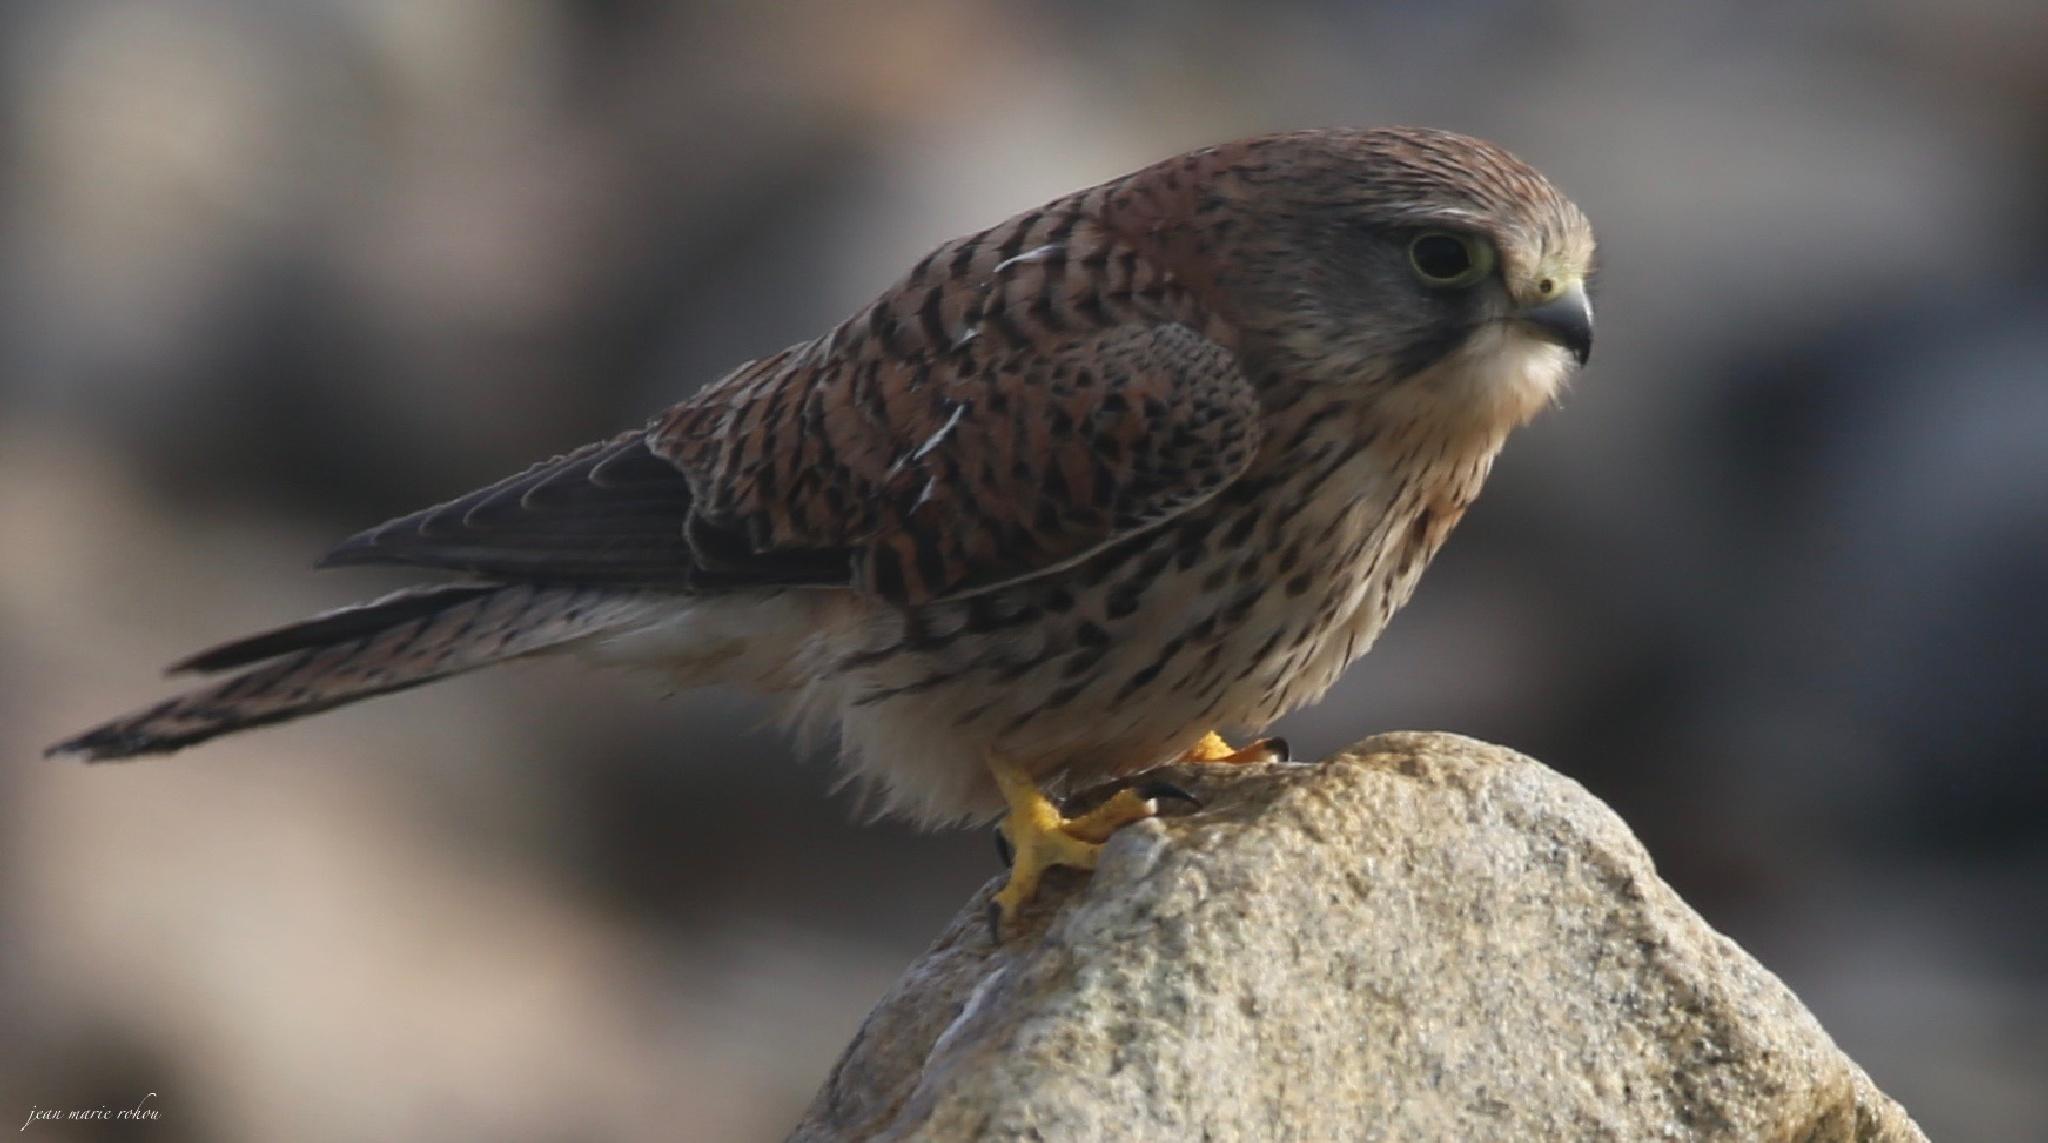 Kestrel- Faucon crécerelle (femal) by jean marie rohou